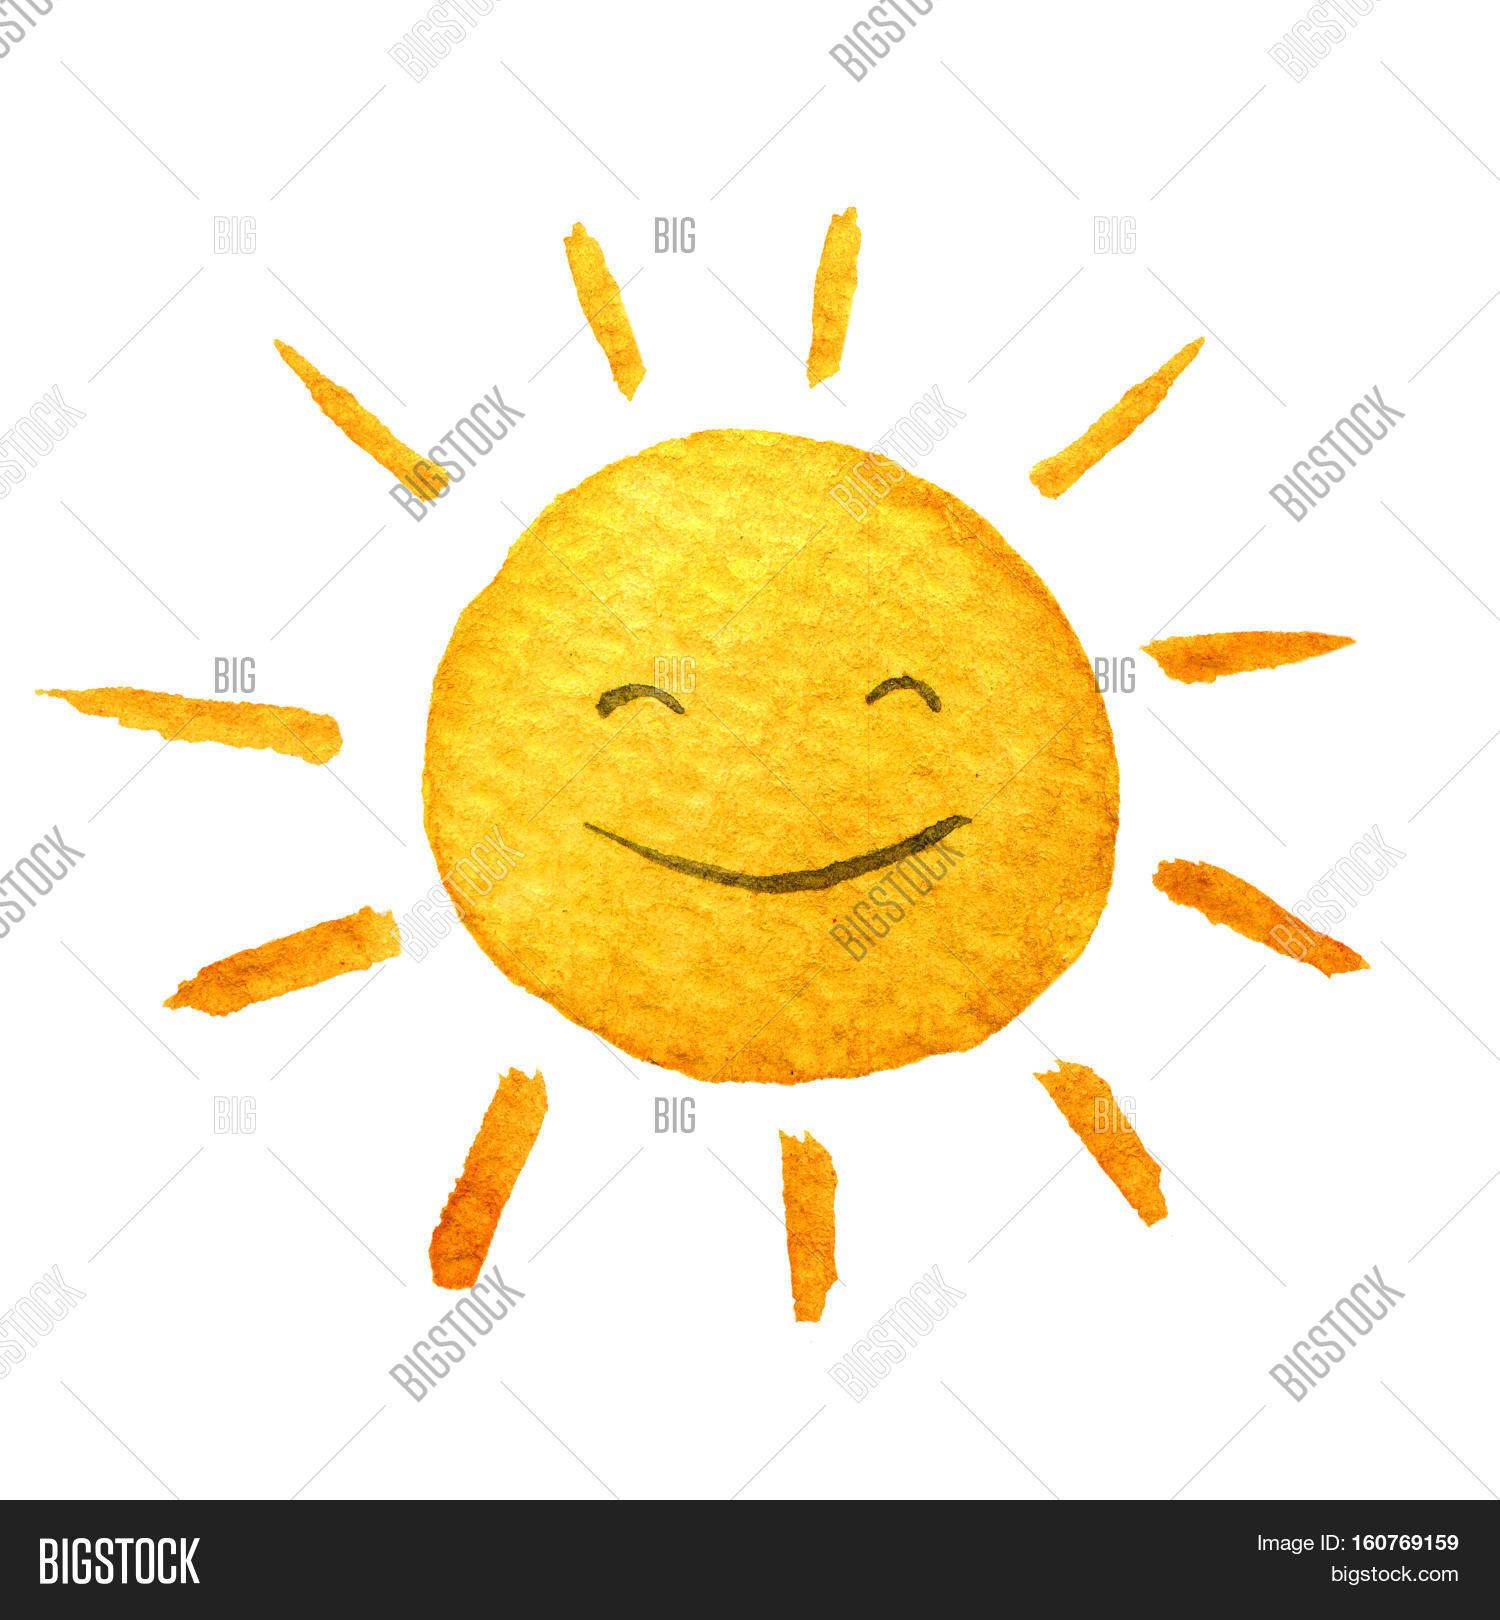 Cute Cartoon Sunshine Hand Drawn Watercolor Illustration Smiling